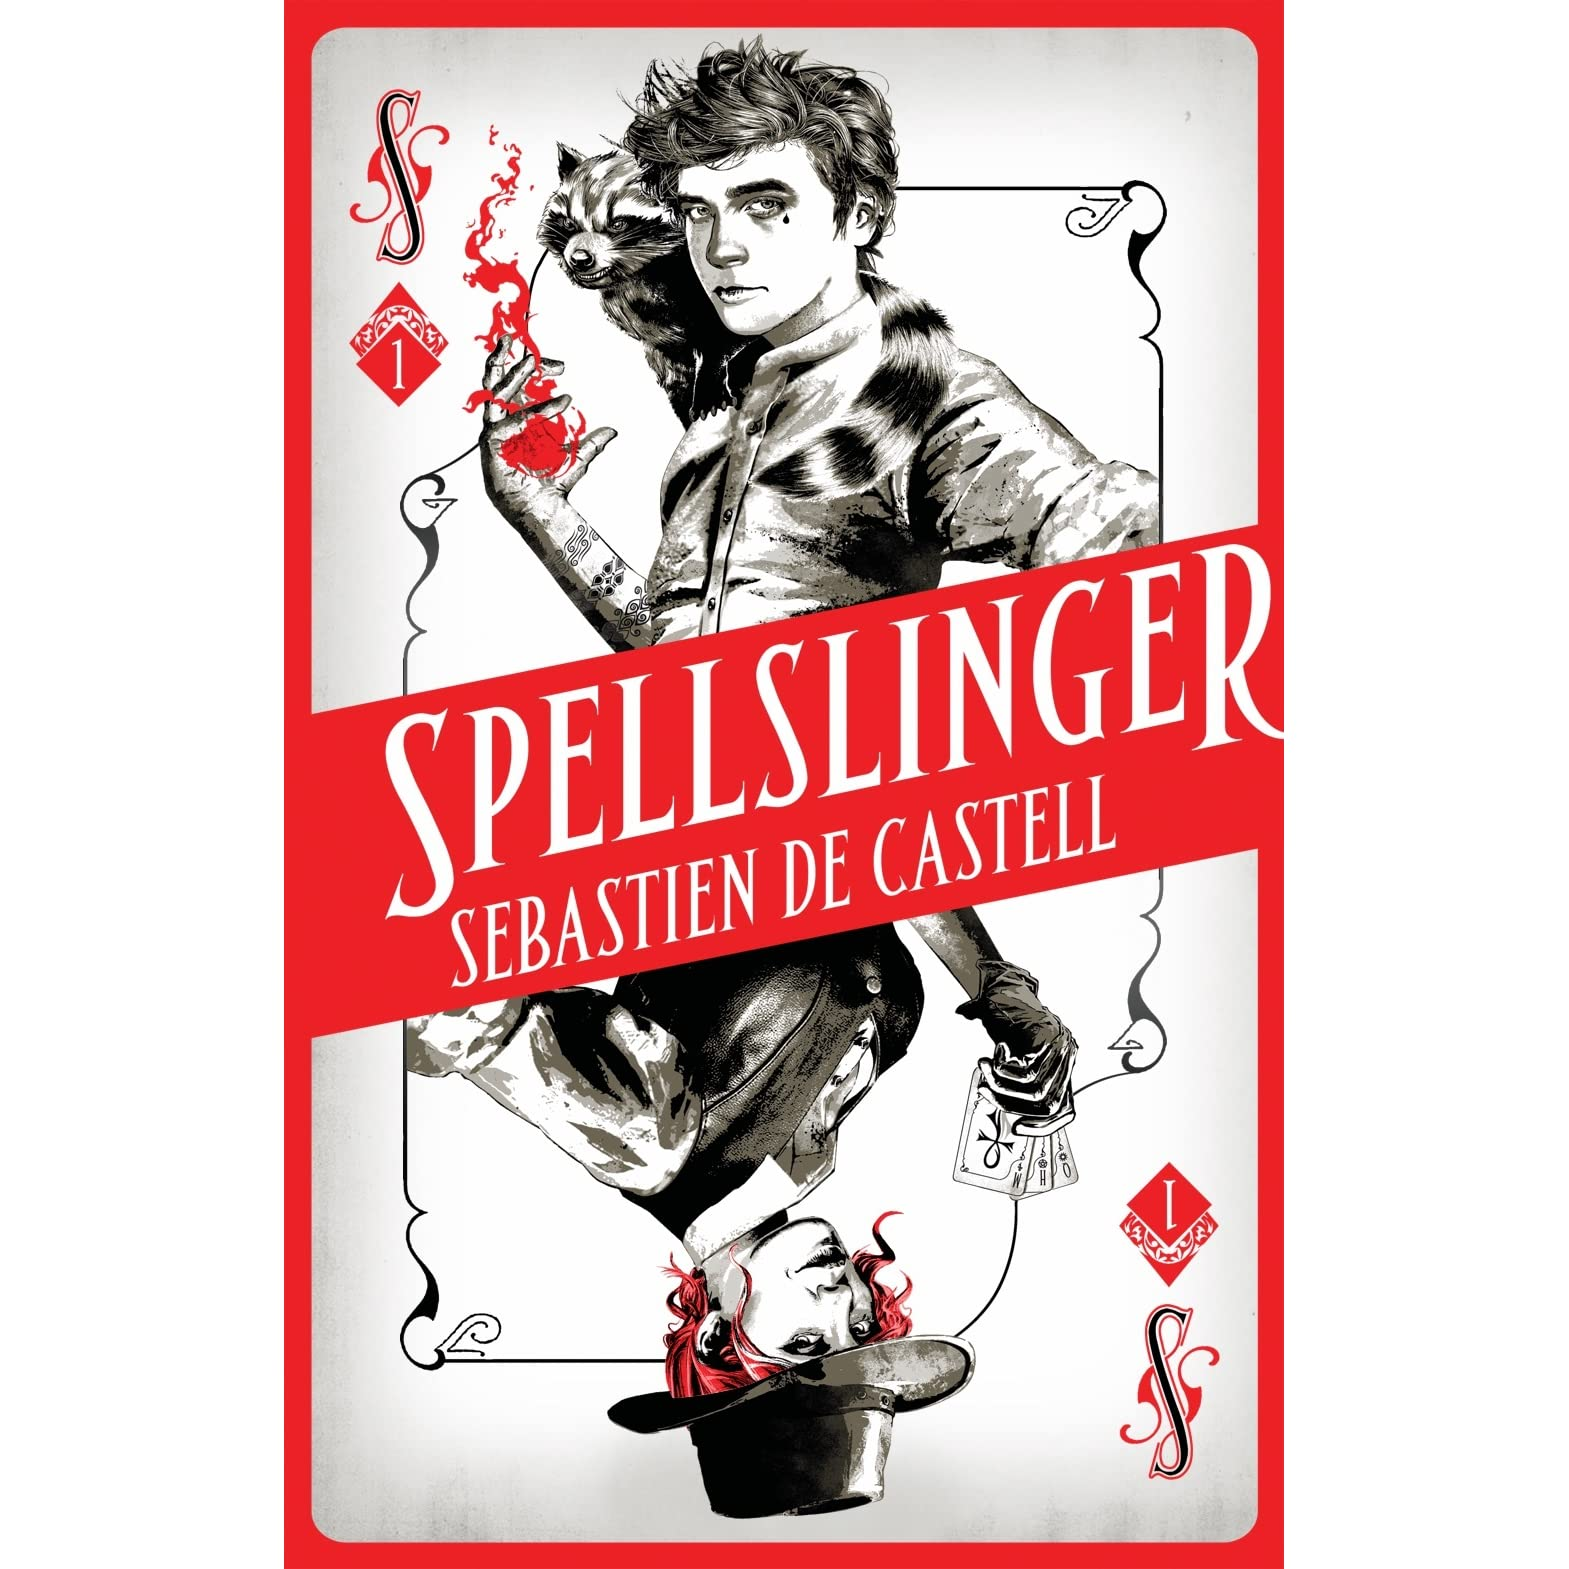 Book Cover Fantasy Baseball : Spellslinger by sebastien de castell — reviews discussion